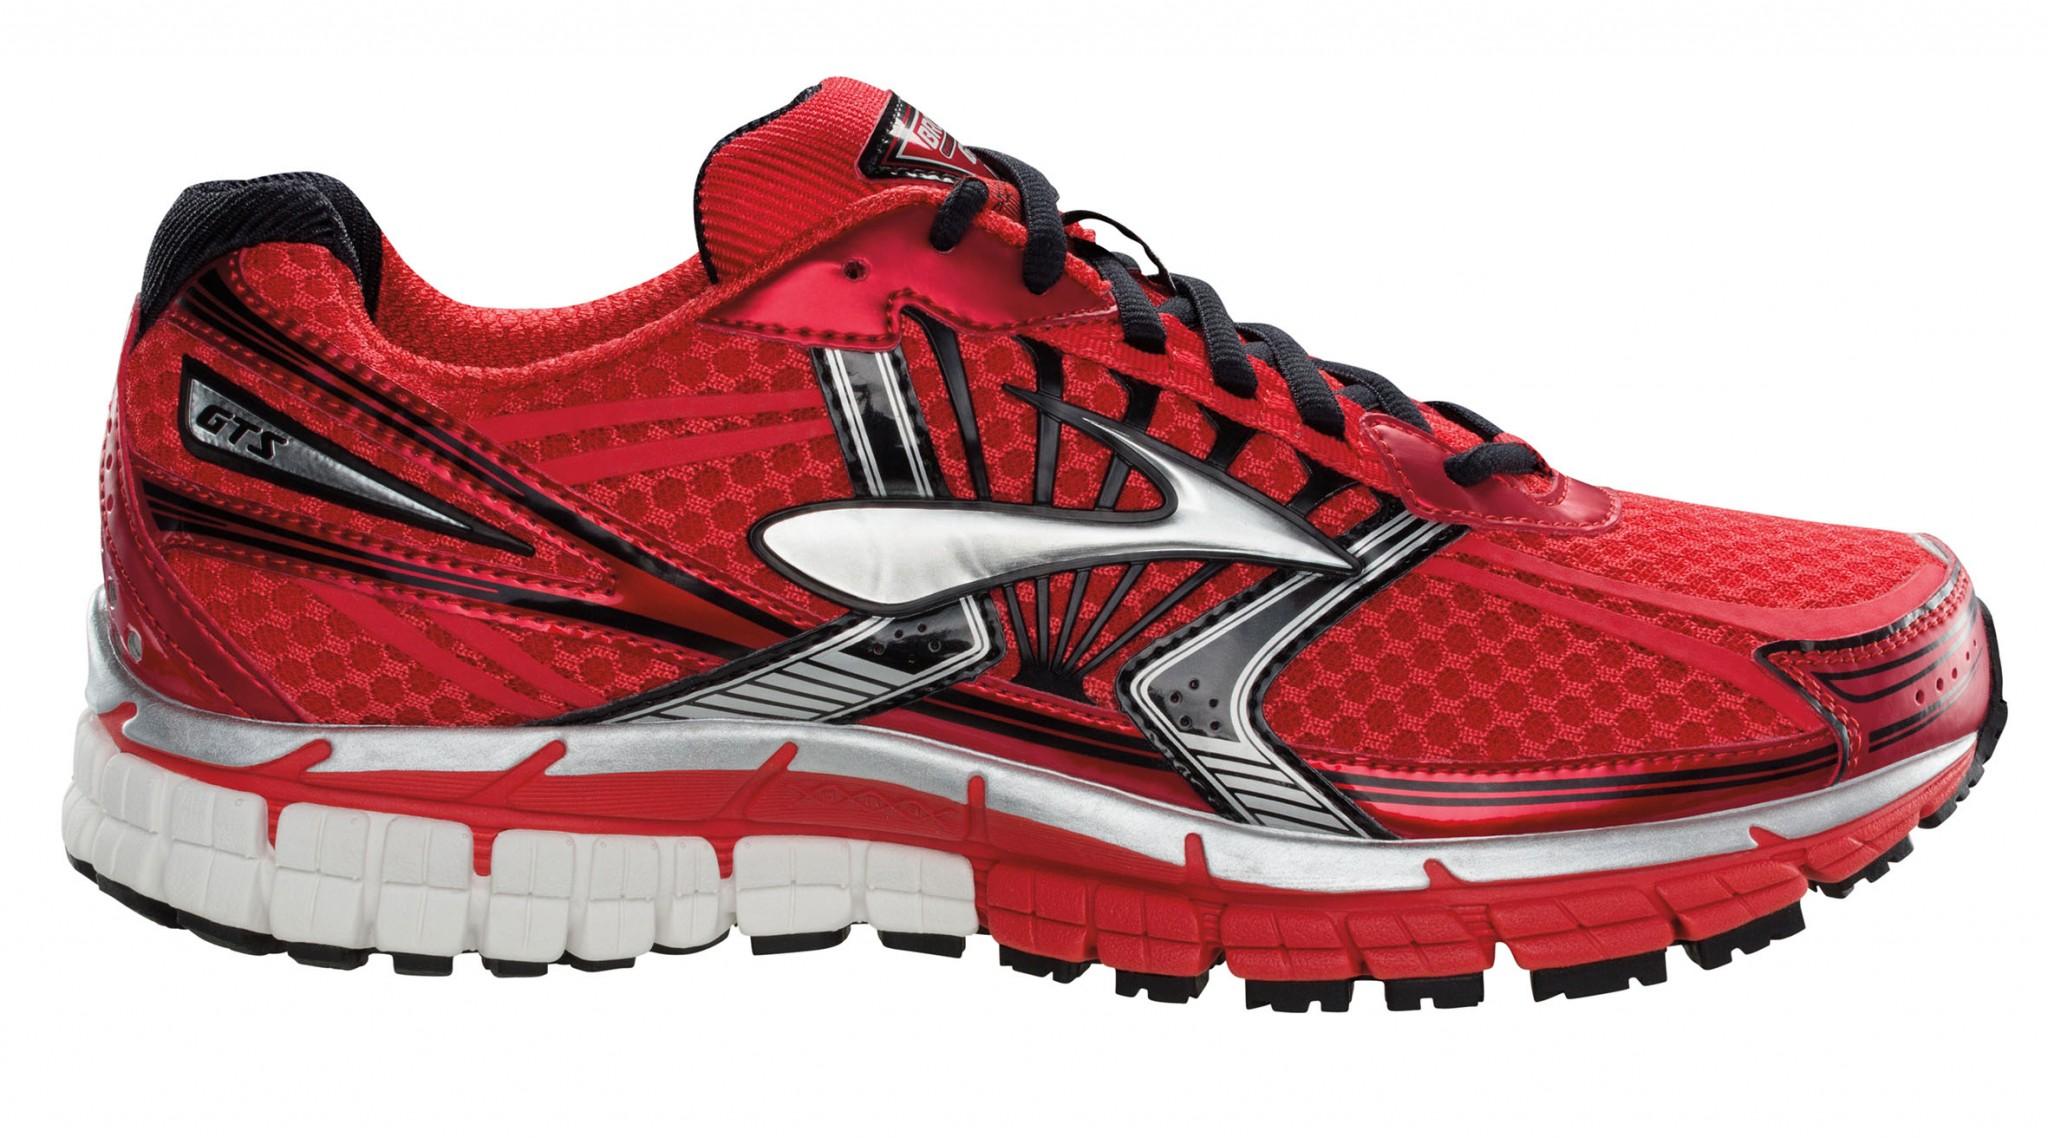 chaussures asics running homme lourd